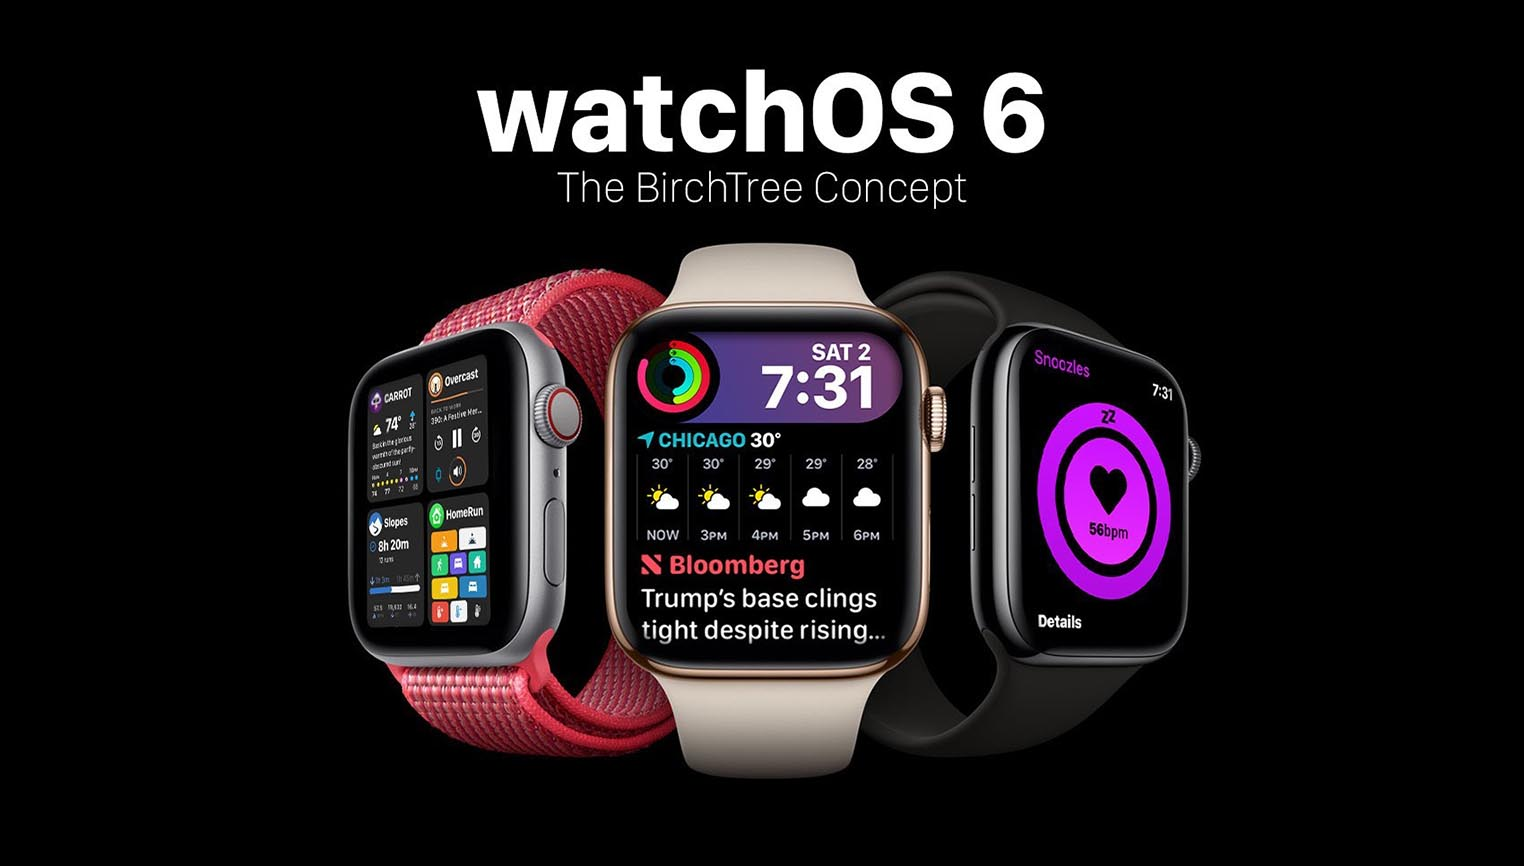 Concept watchOS 6